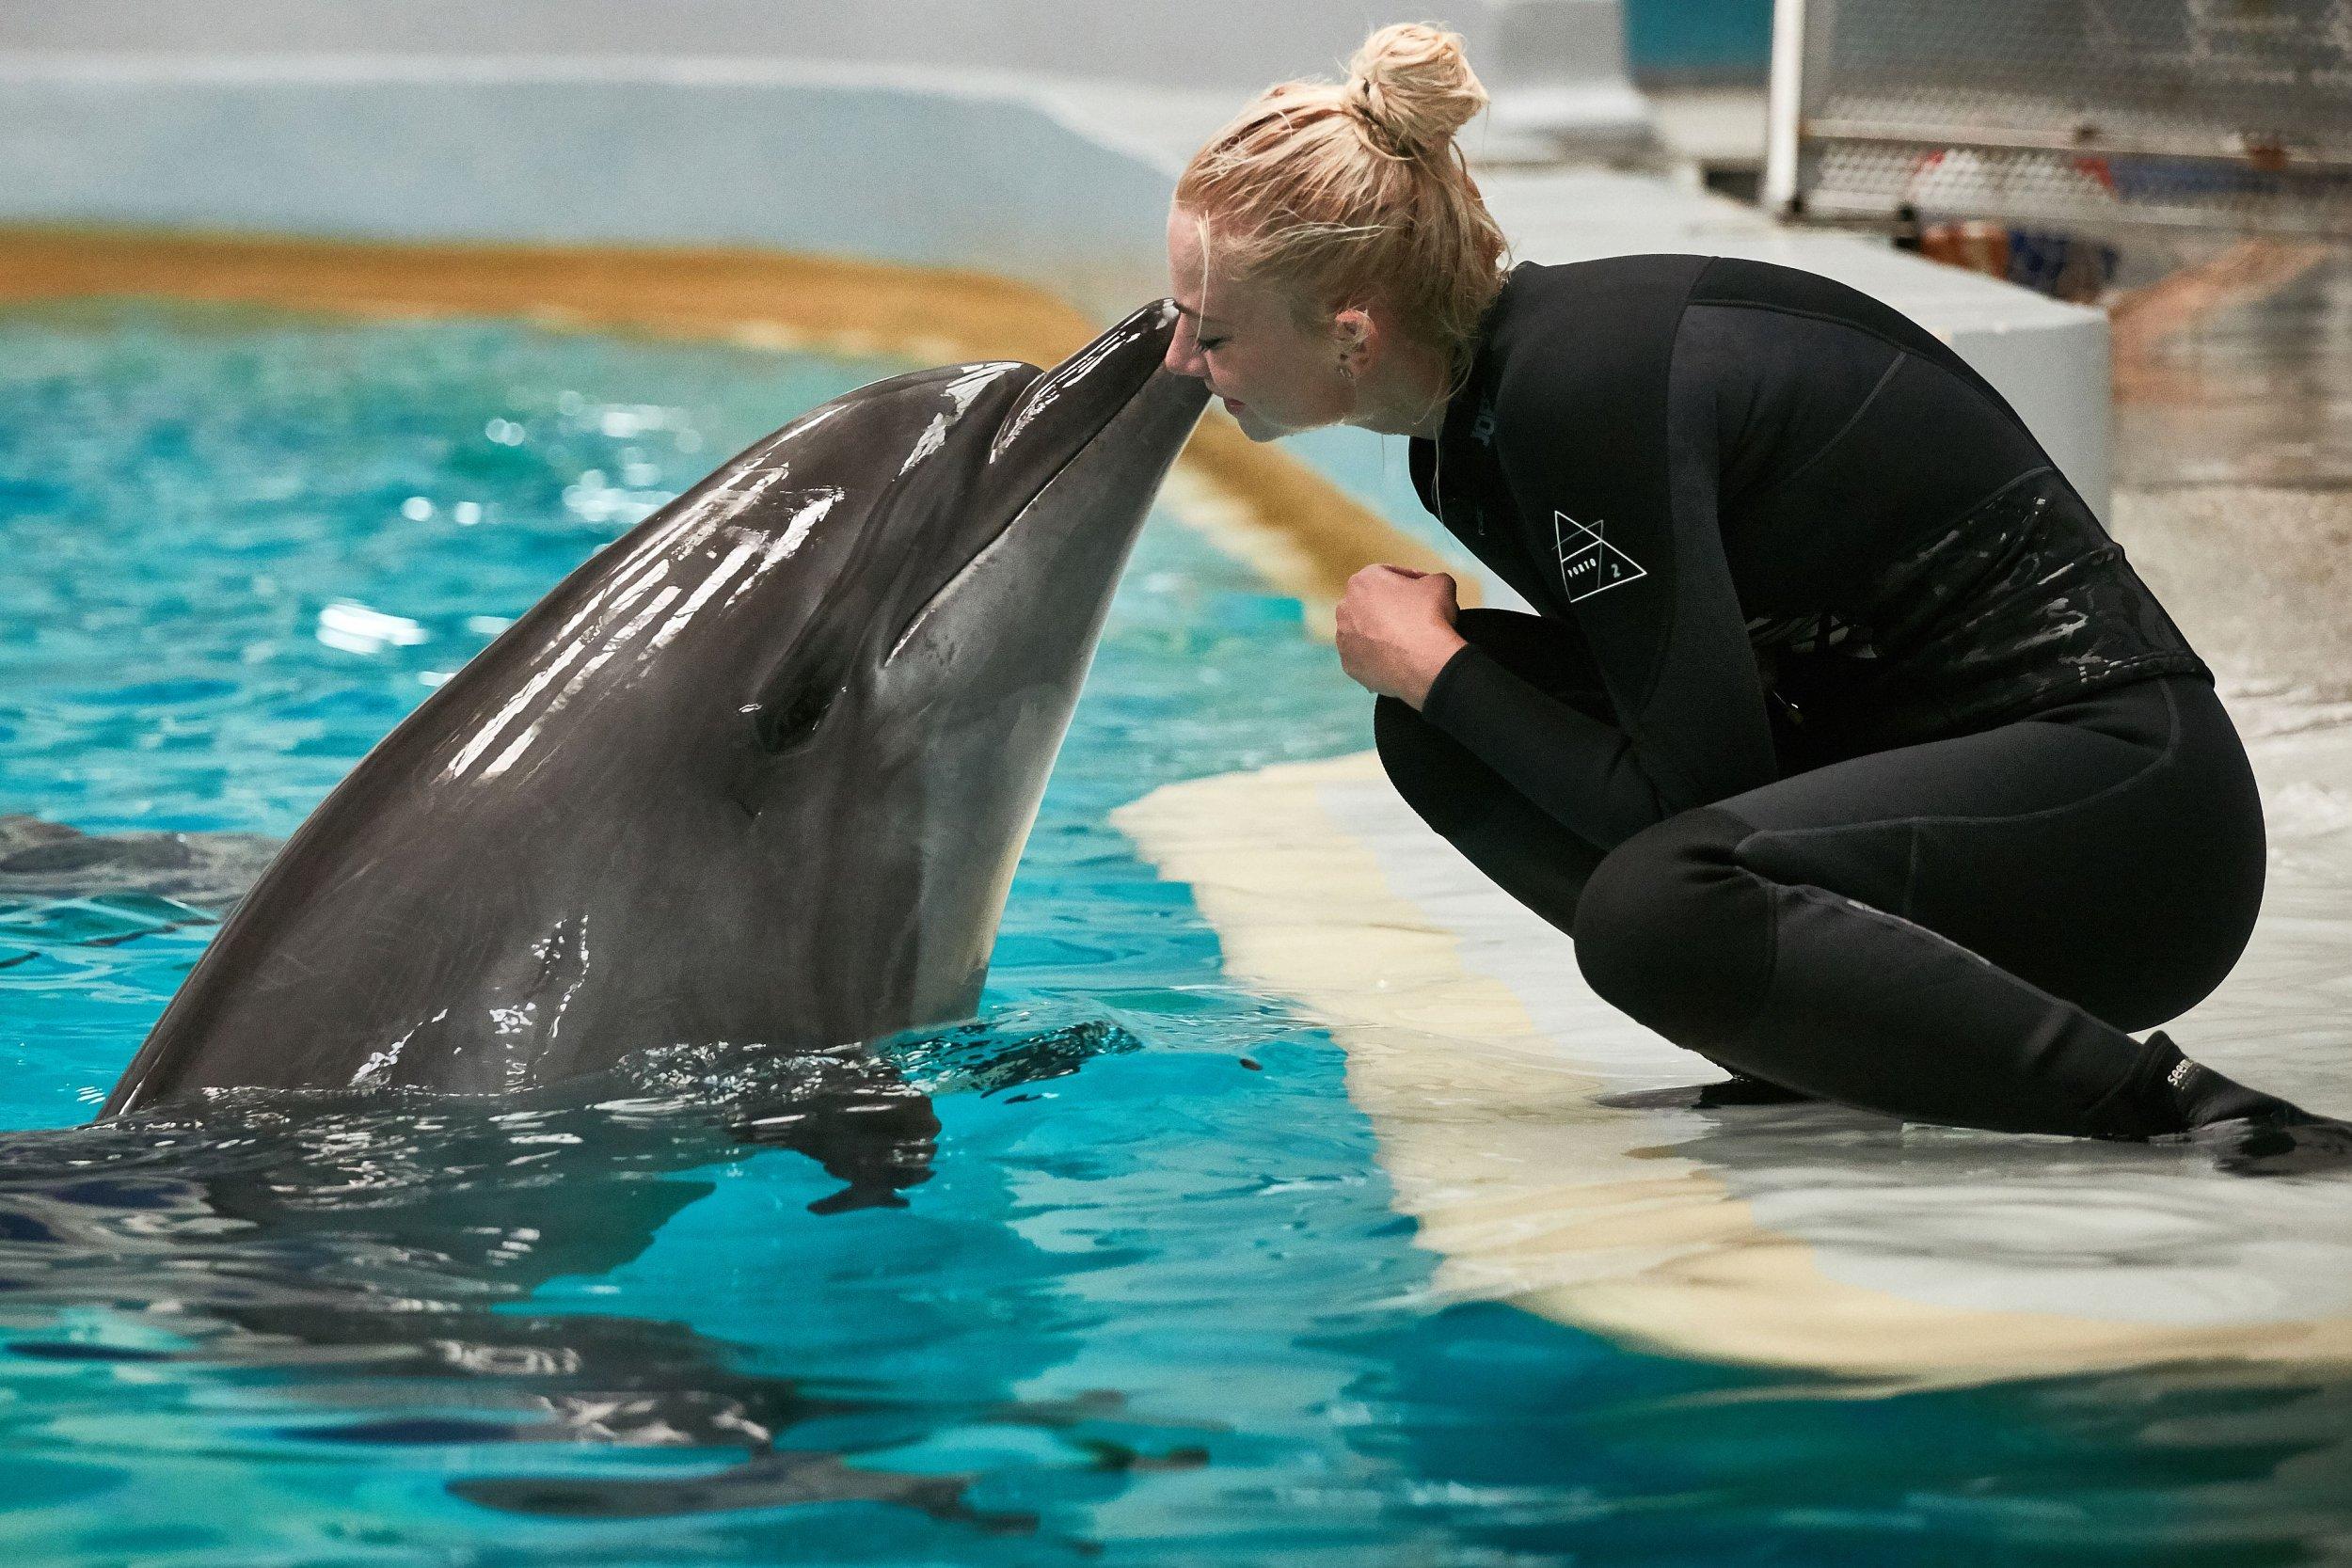 captive dolphins  u0026 39 look forward u0026 39  to play with humans  like pavlov u0026 39 s dogs